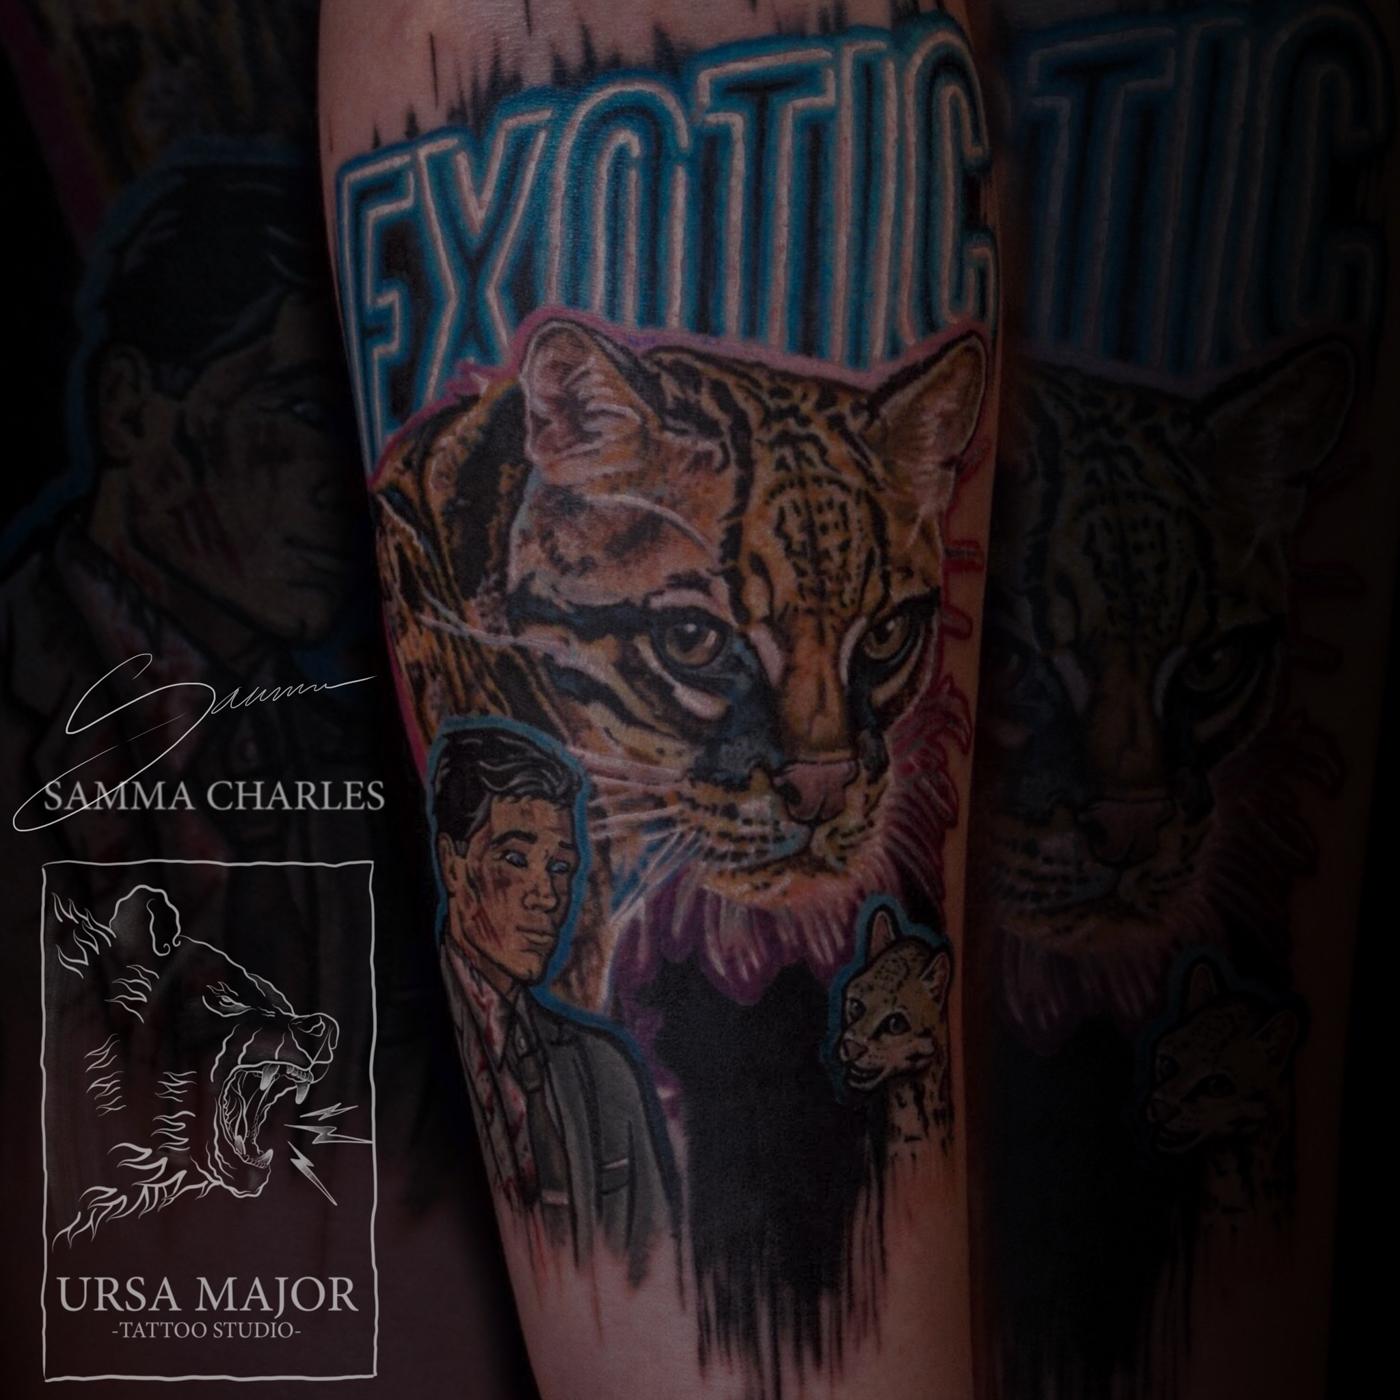 oxfordshire-tattoo-studio-37.jpg